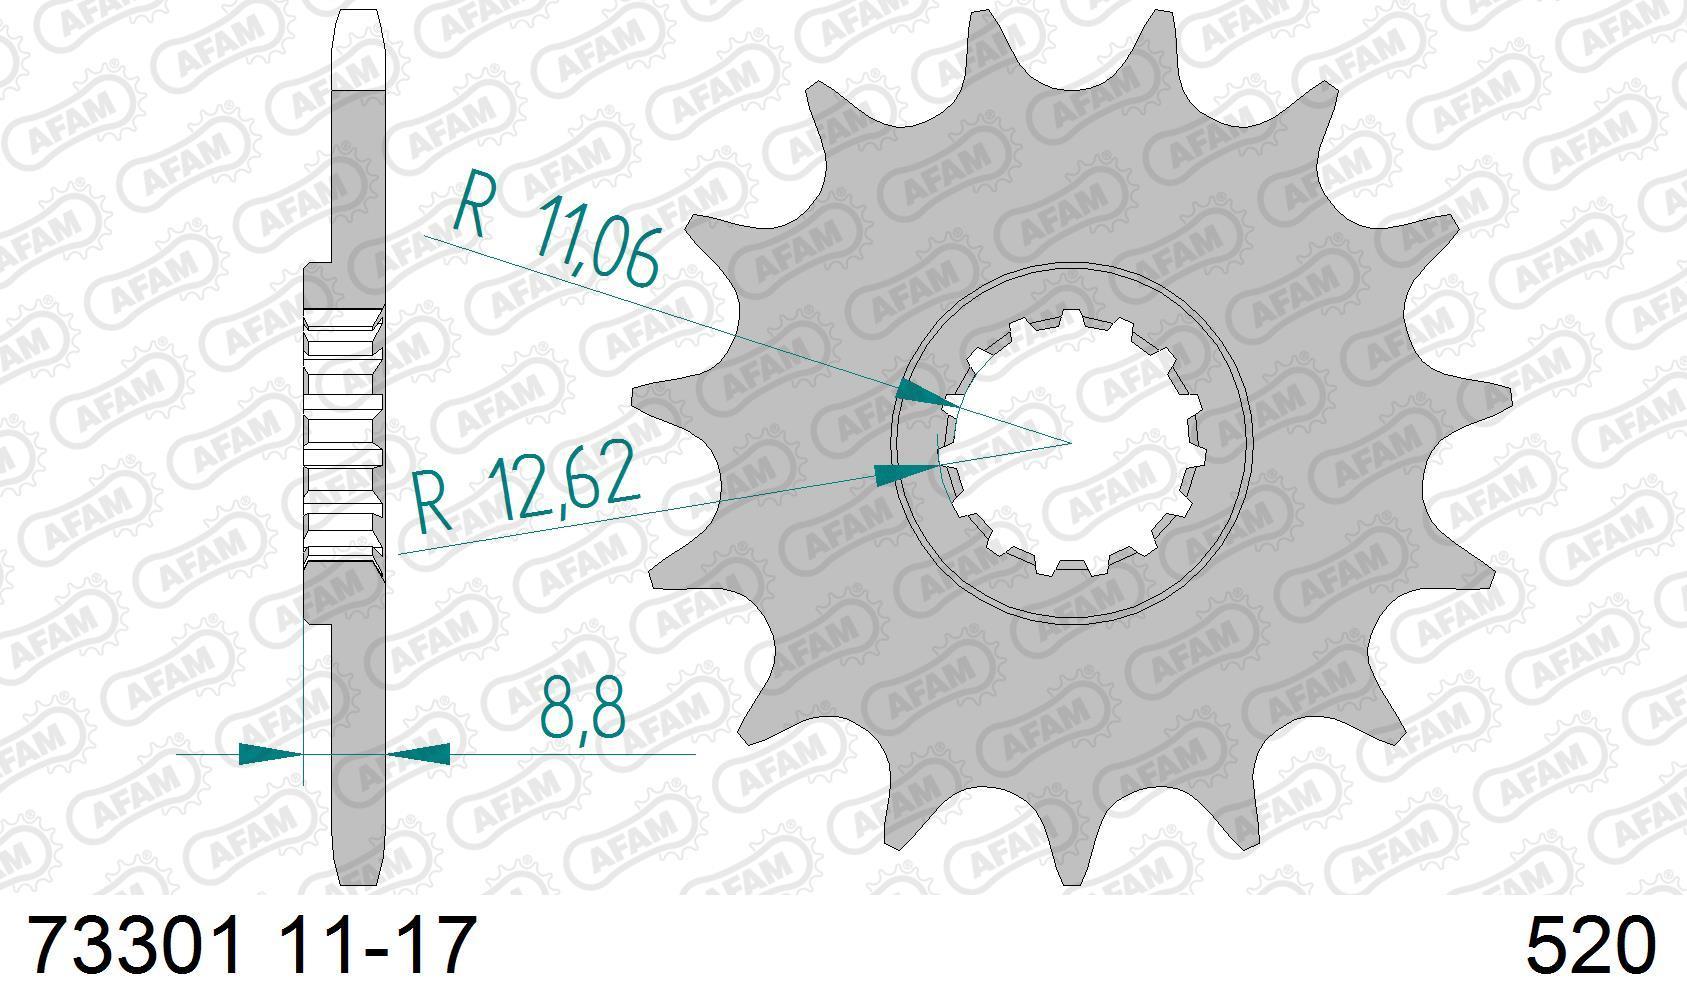 Motorrad Kettenritzel 73301-14 Niedrige Preise - Jetzt kaufen!